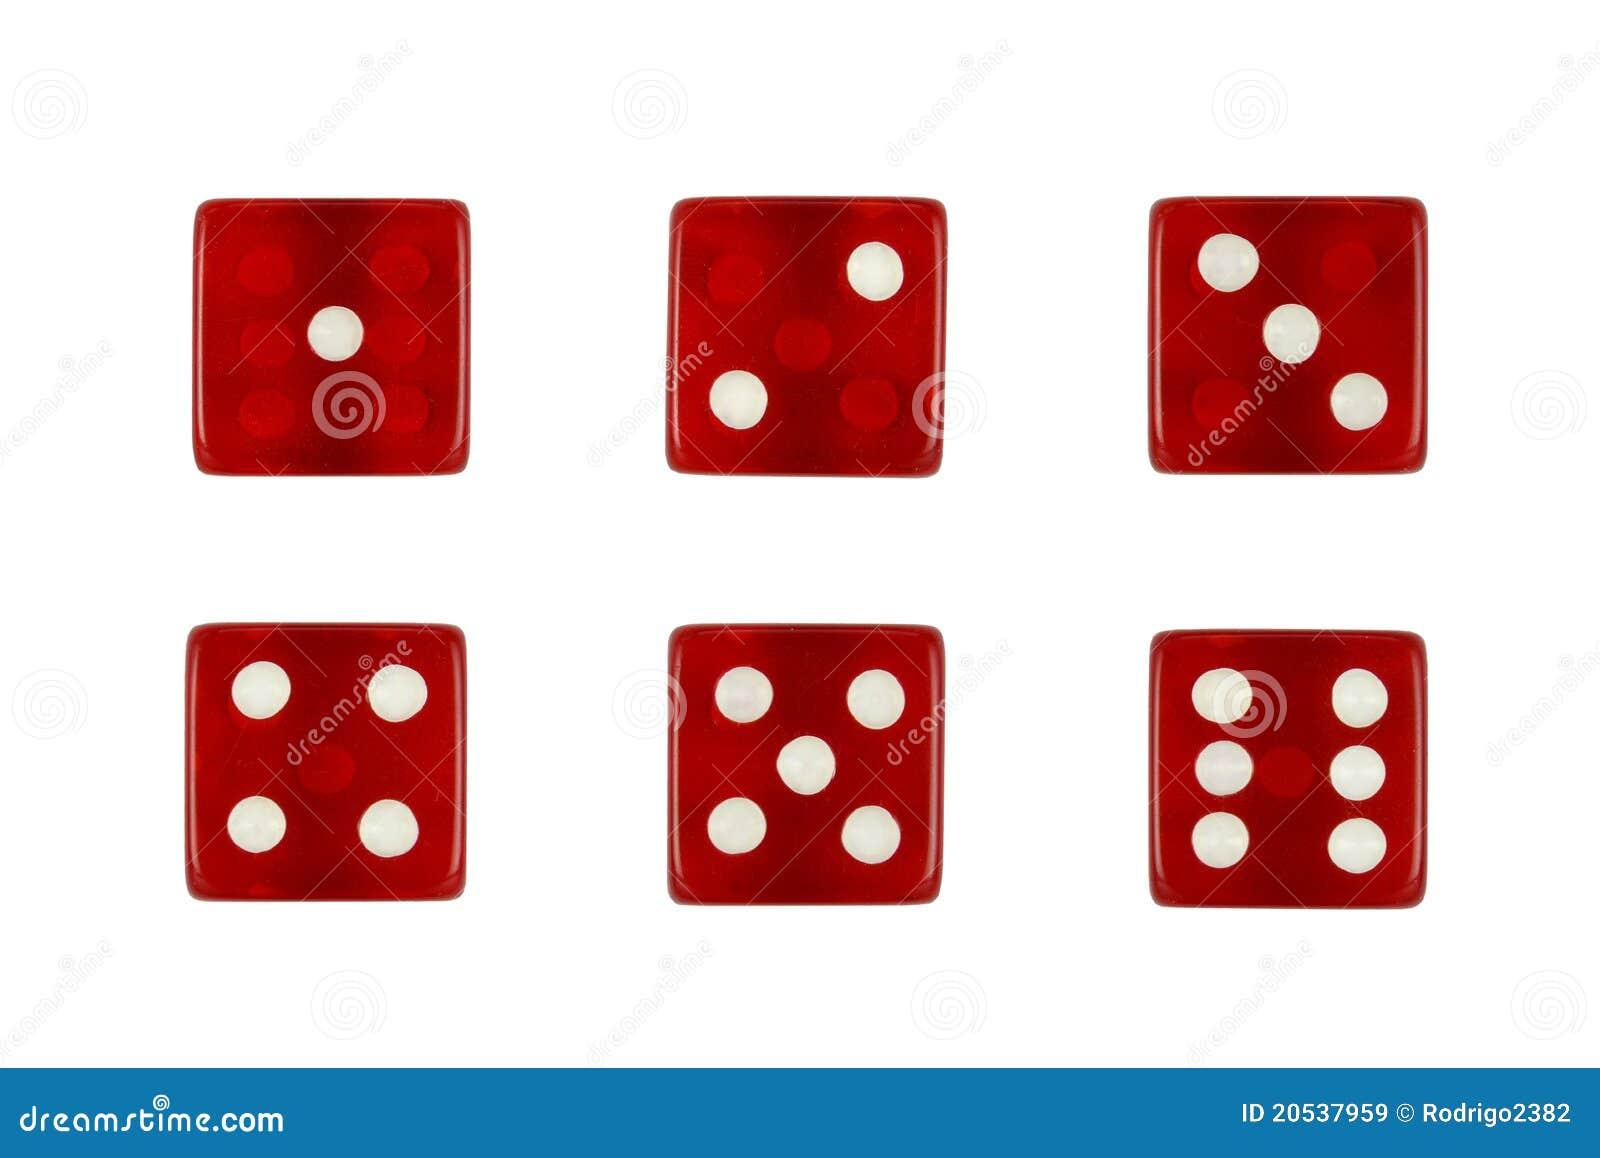 Casino skates